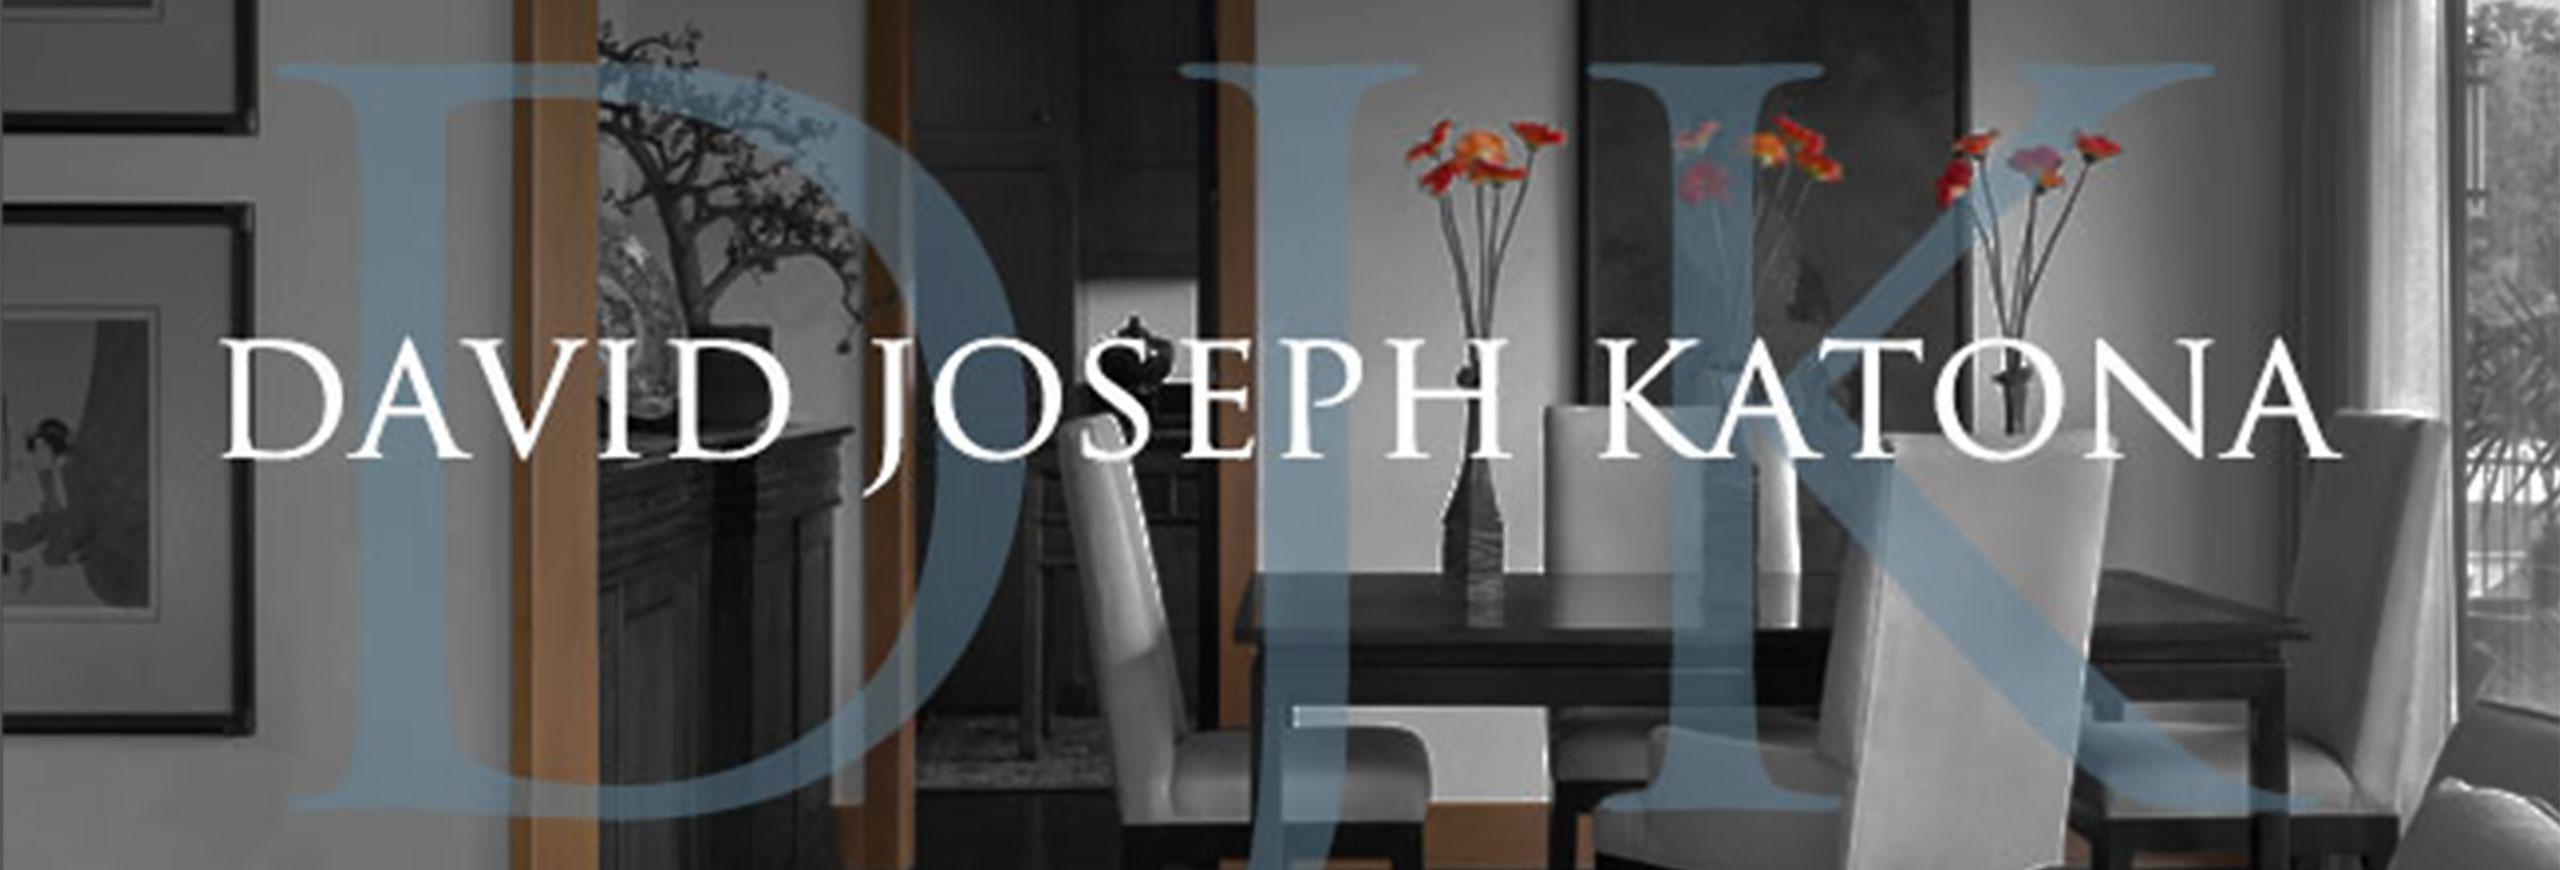 David Joseph Katona Banner Logo